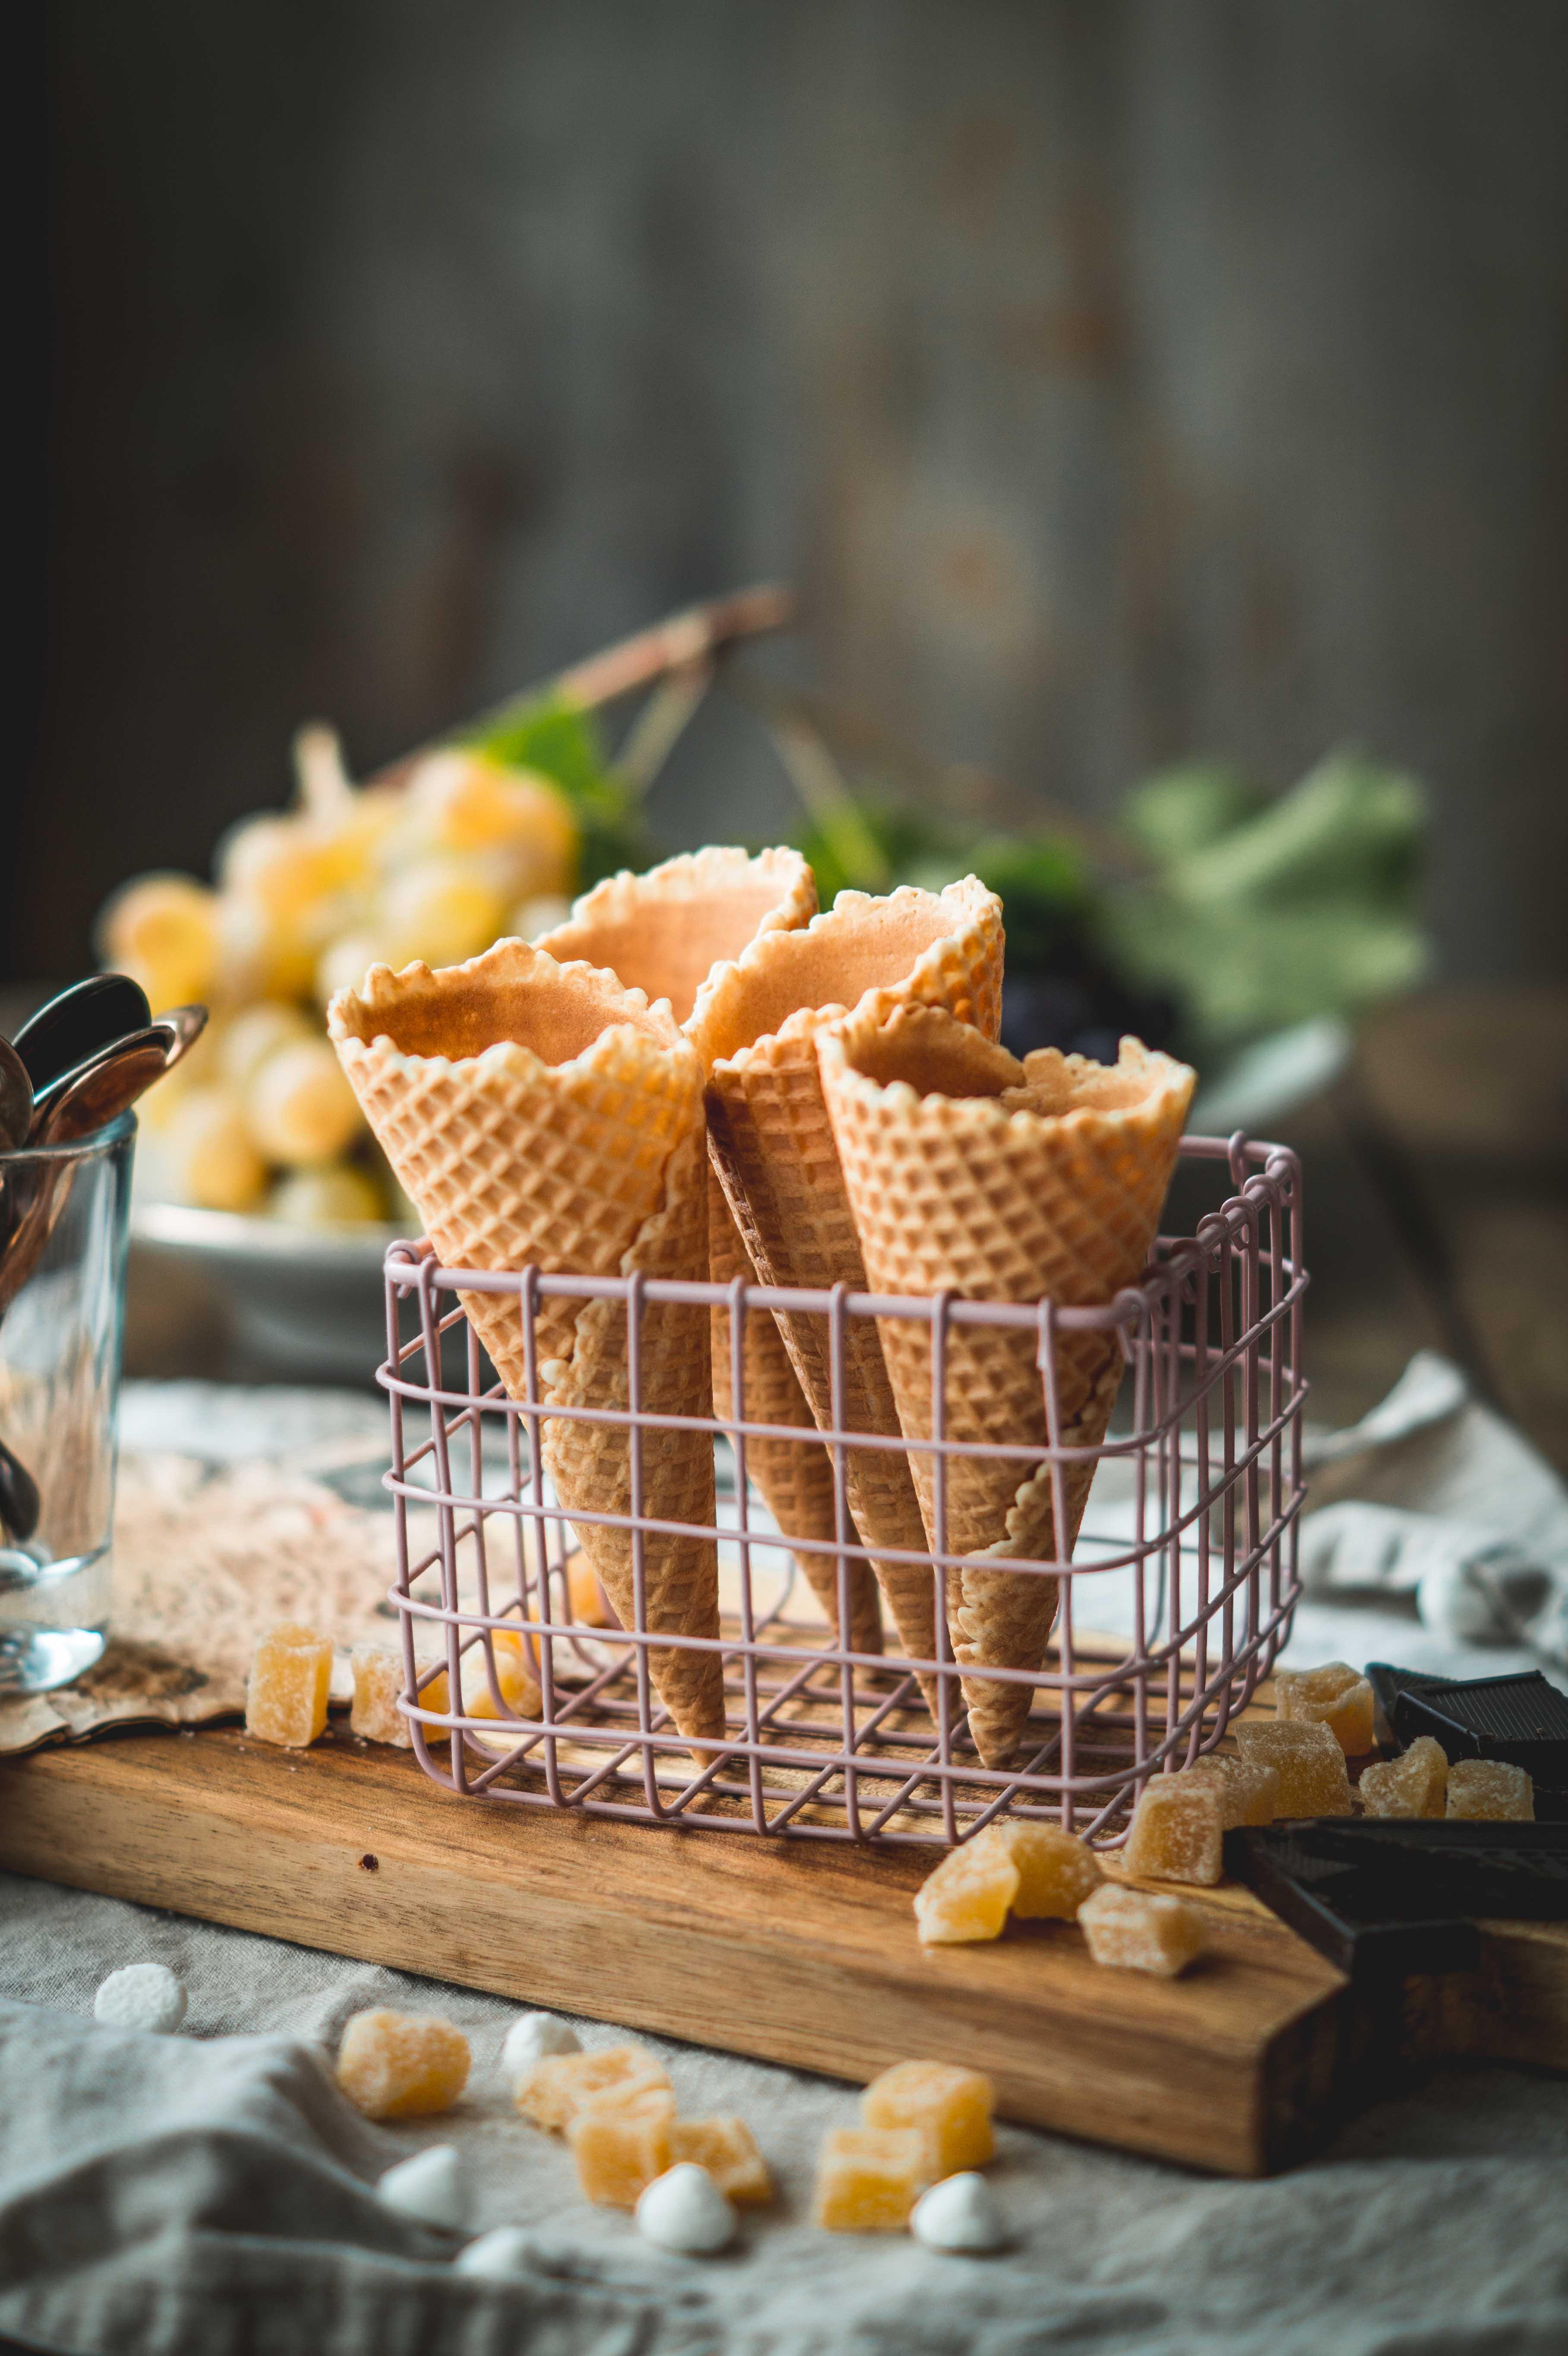 Schokoladen Ingwer Eis